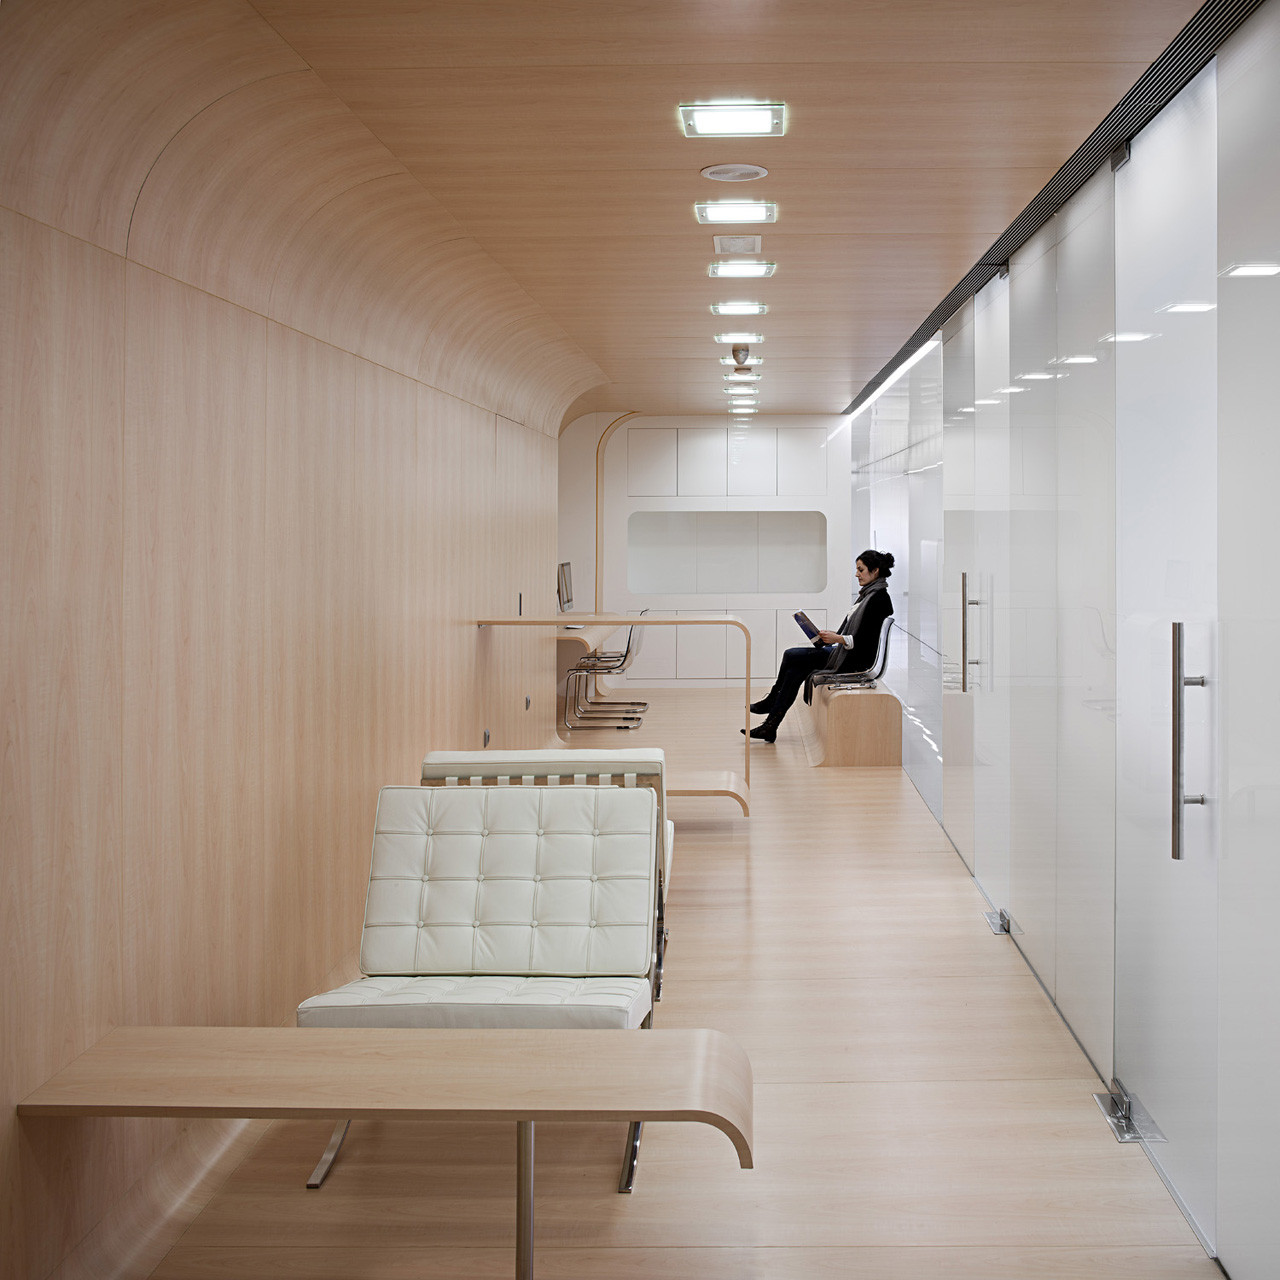 Gallery Of Dental Office Estudio Arquitectura Hago 9